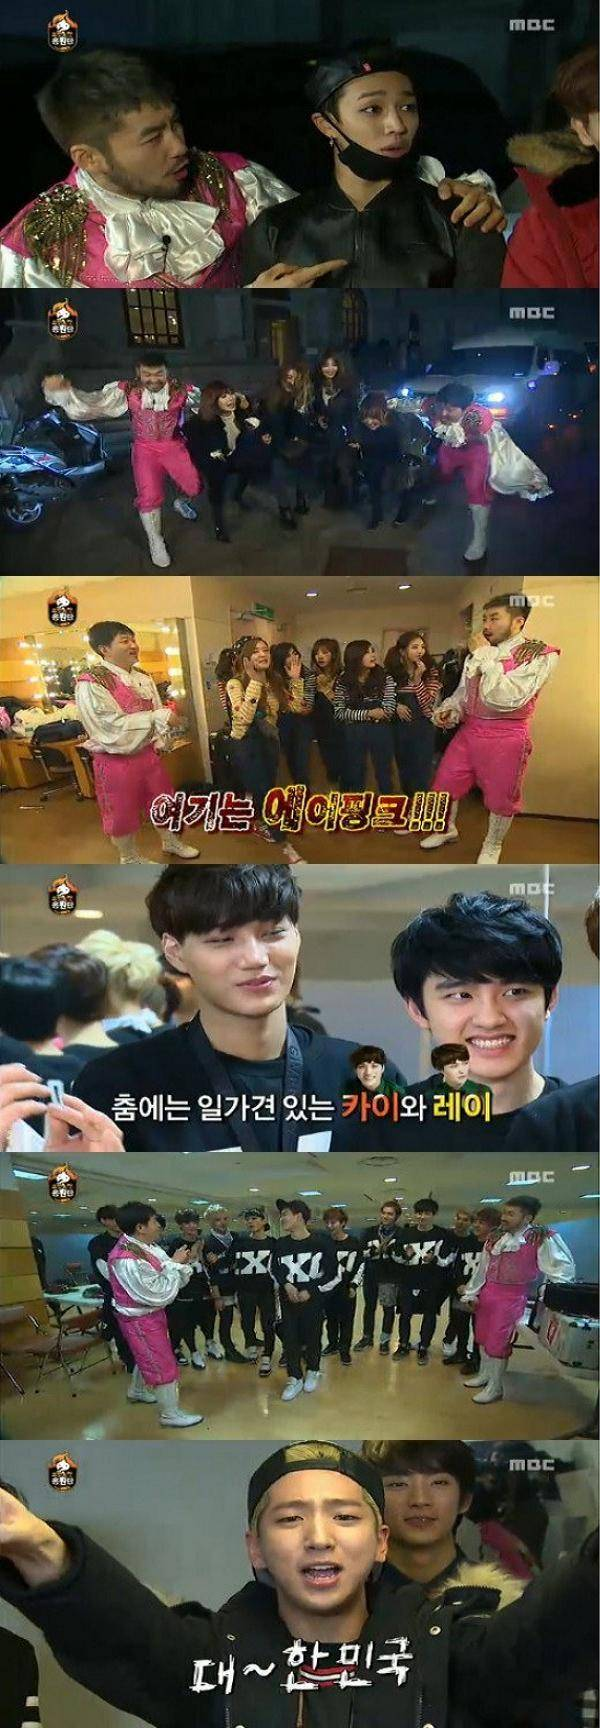 4minute, A Pink, B1A4, B2ST, EXO, Noh Hong Chul, Jung Hyung Don